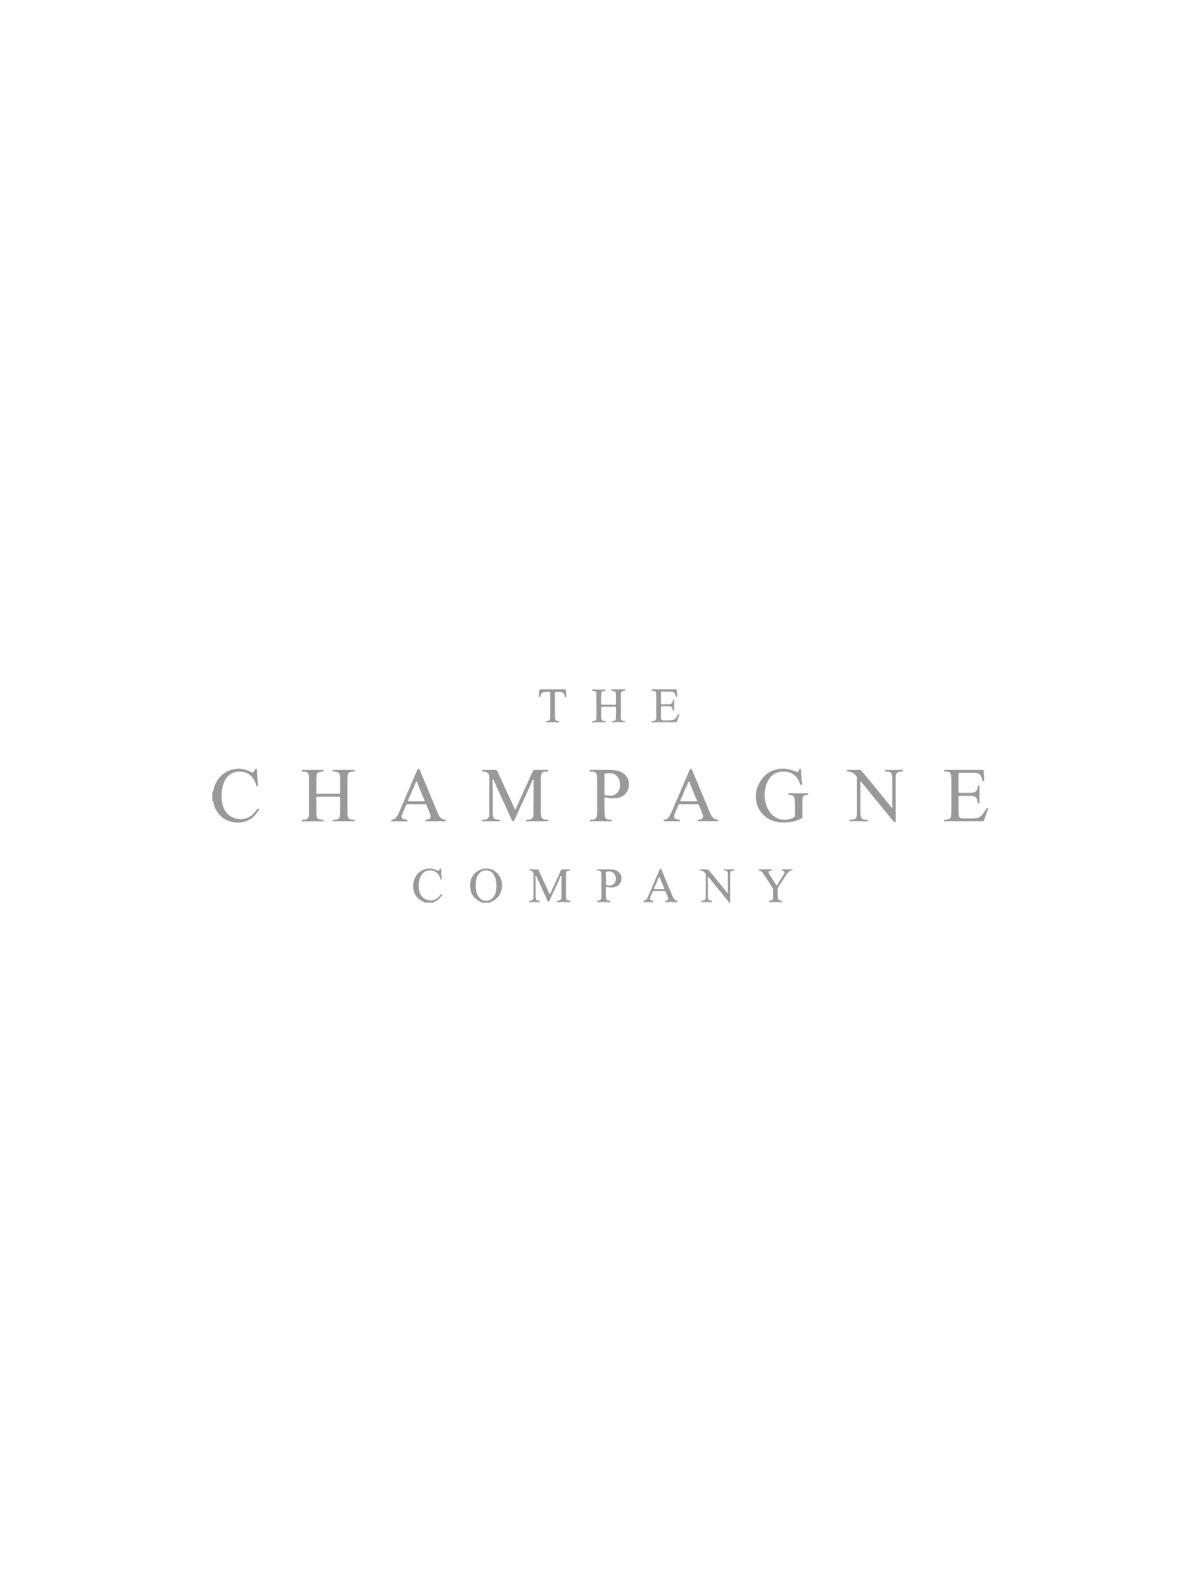 Thienot Alain Champagne Vigne Aux Gamins 2002 Gift Boxed